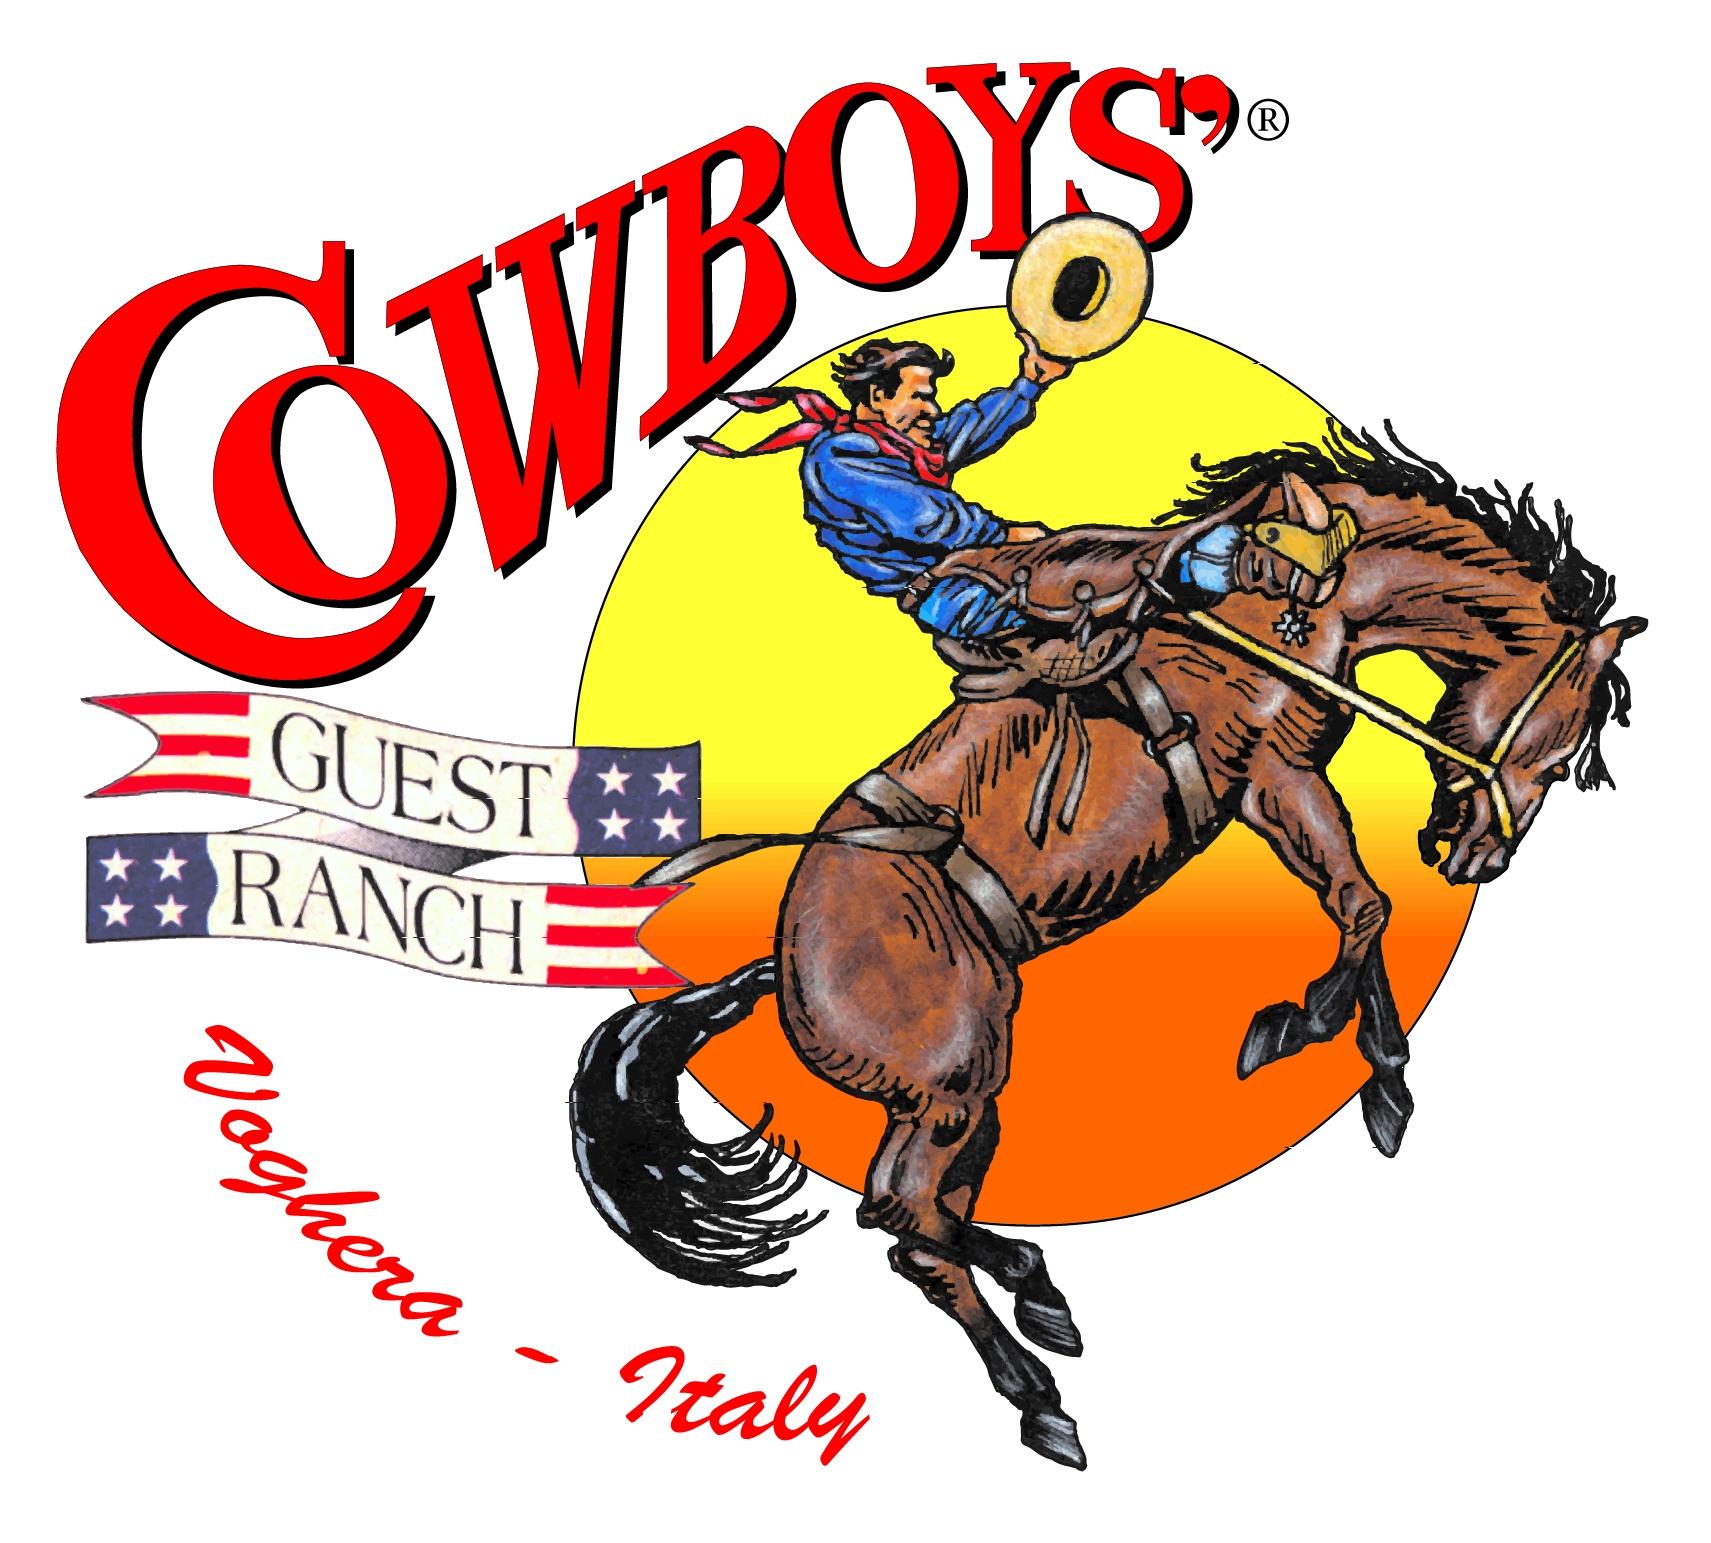 Cowboys Guest Ranch.